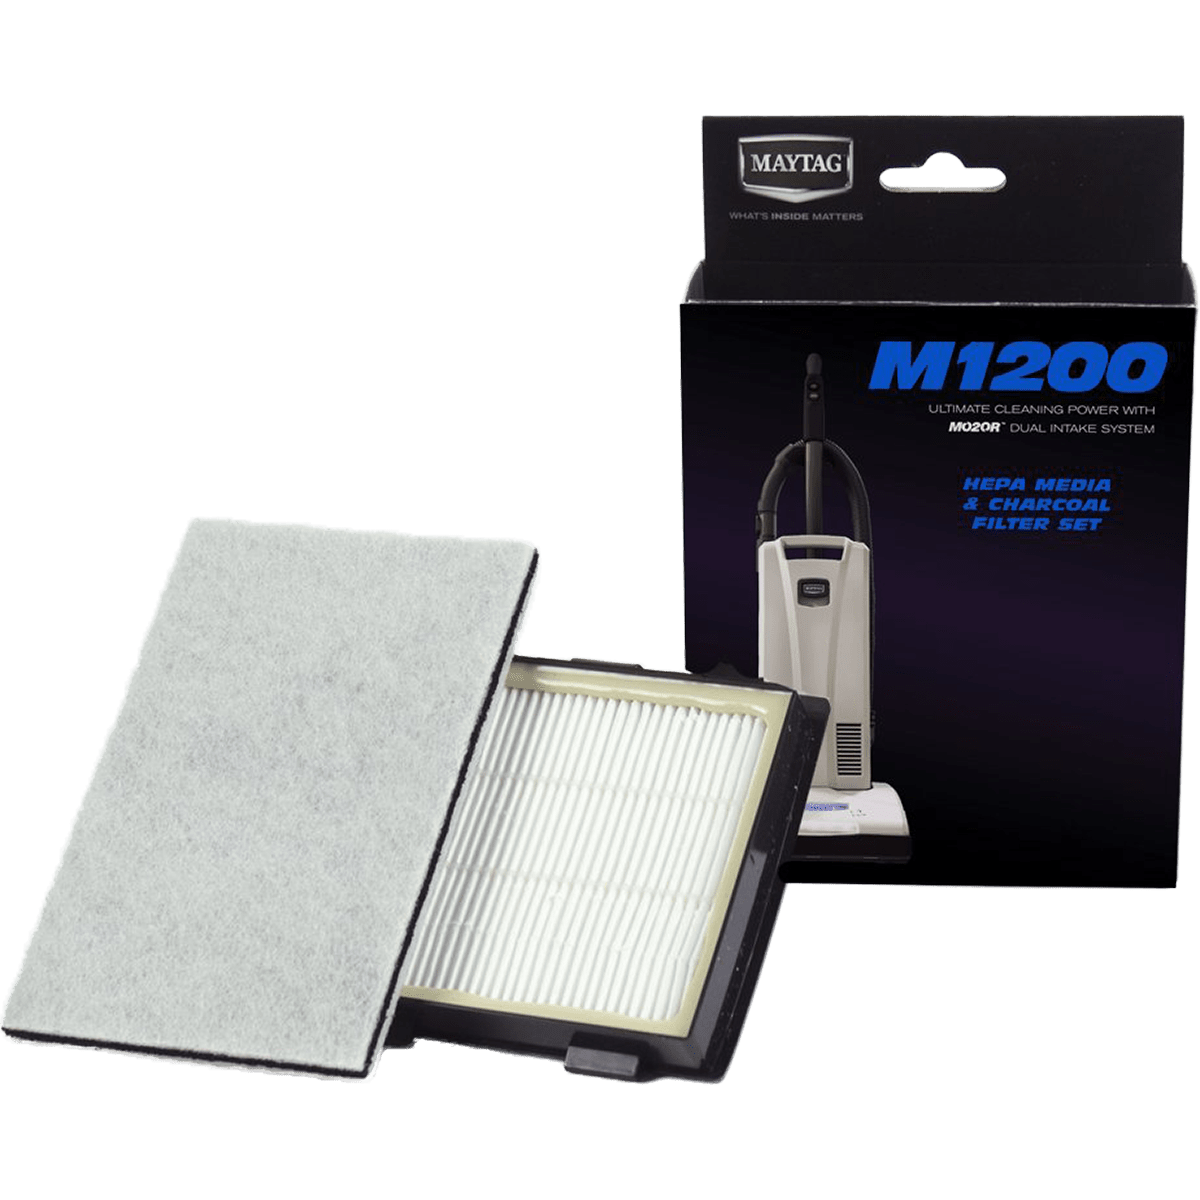 M1200 HEPA Media Filter Set ma5484